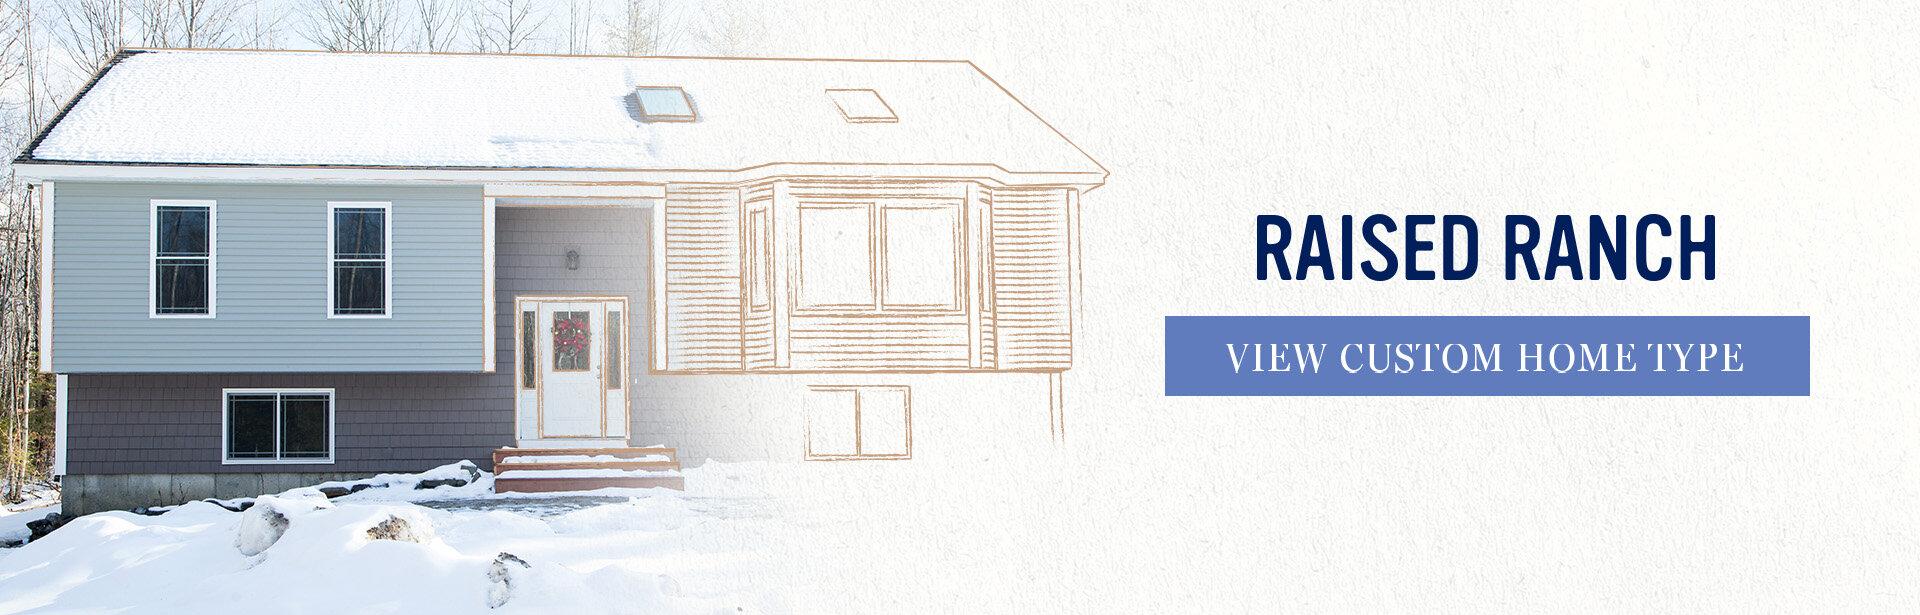 New-Home-Designs-Banner-Raised-Ranch.jpg